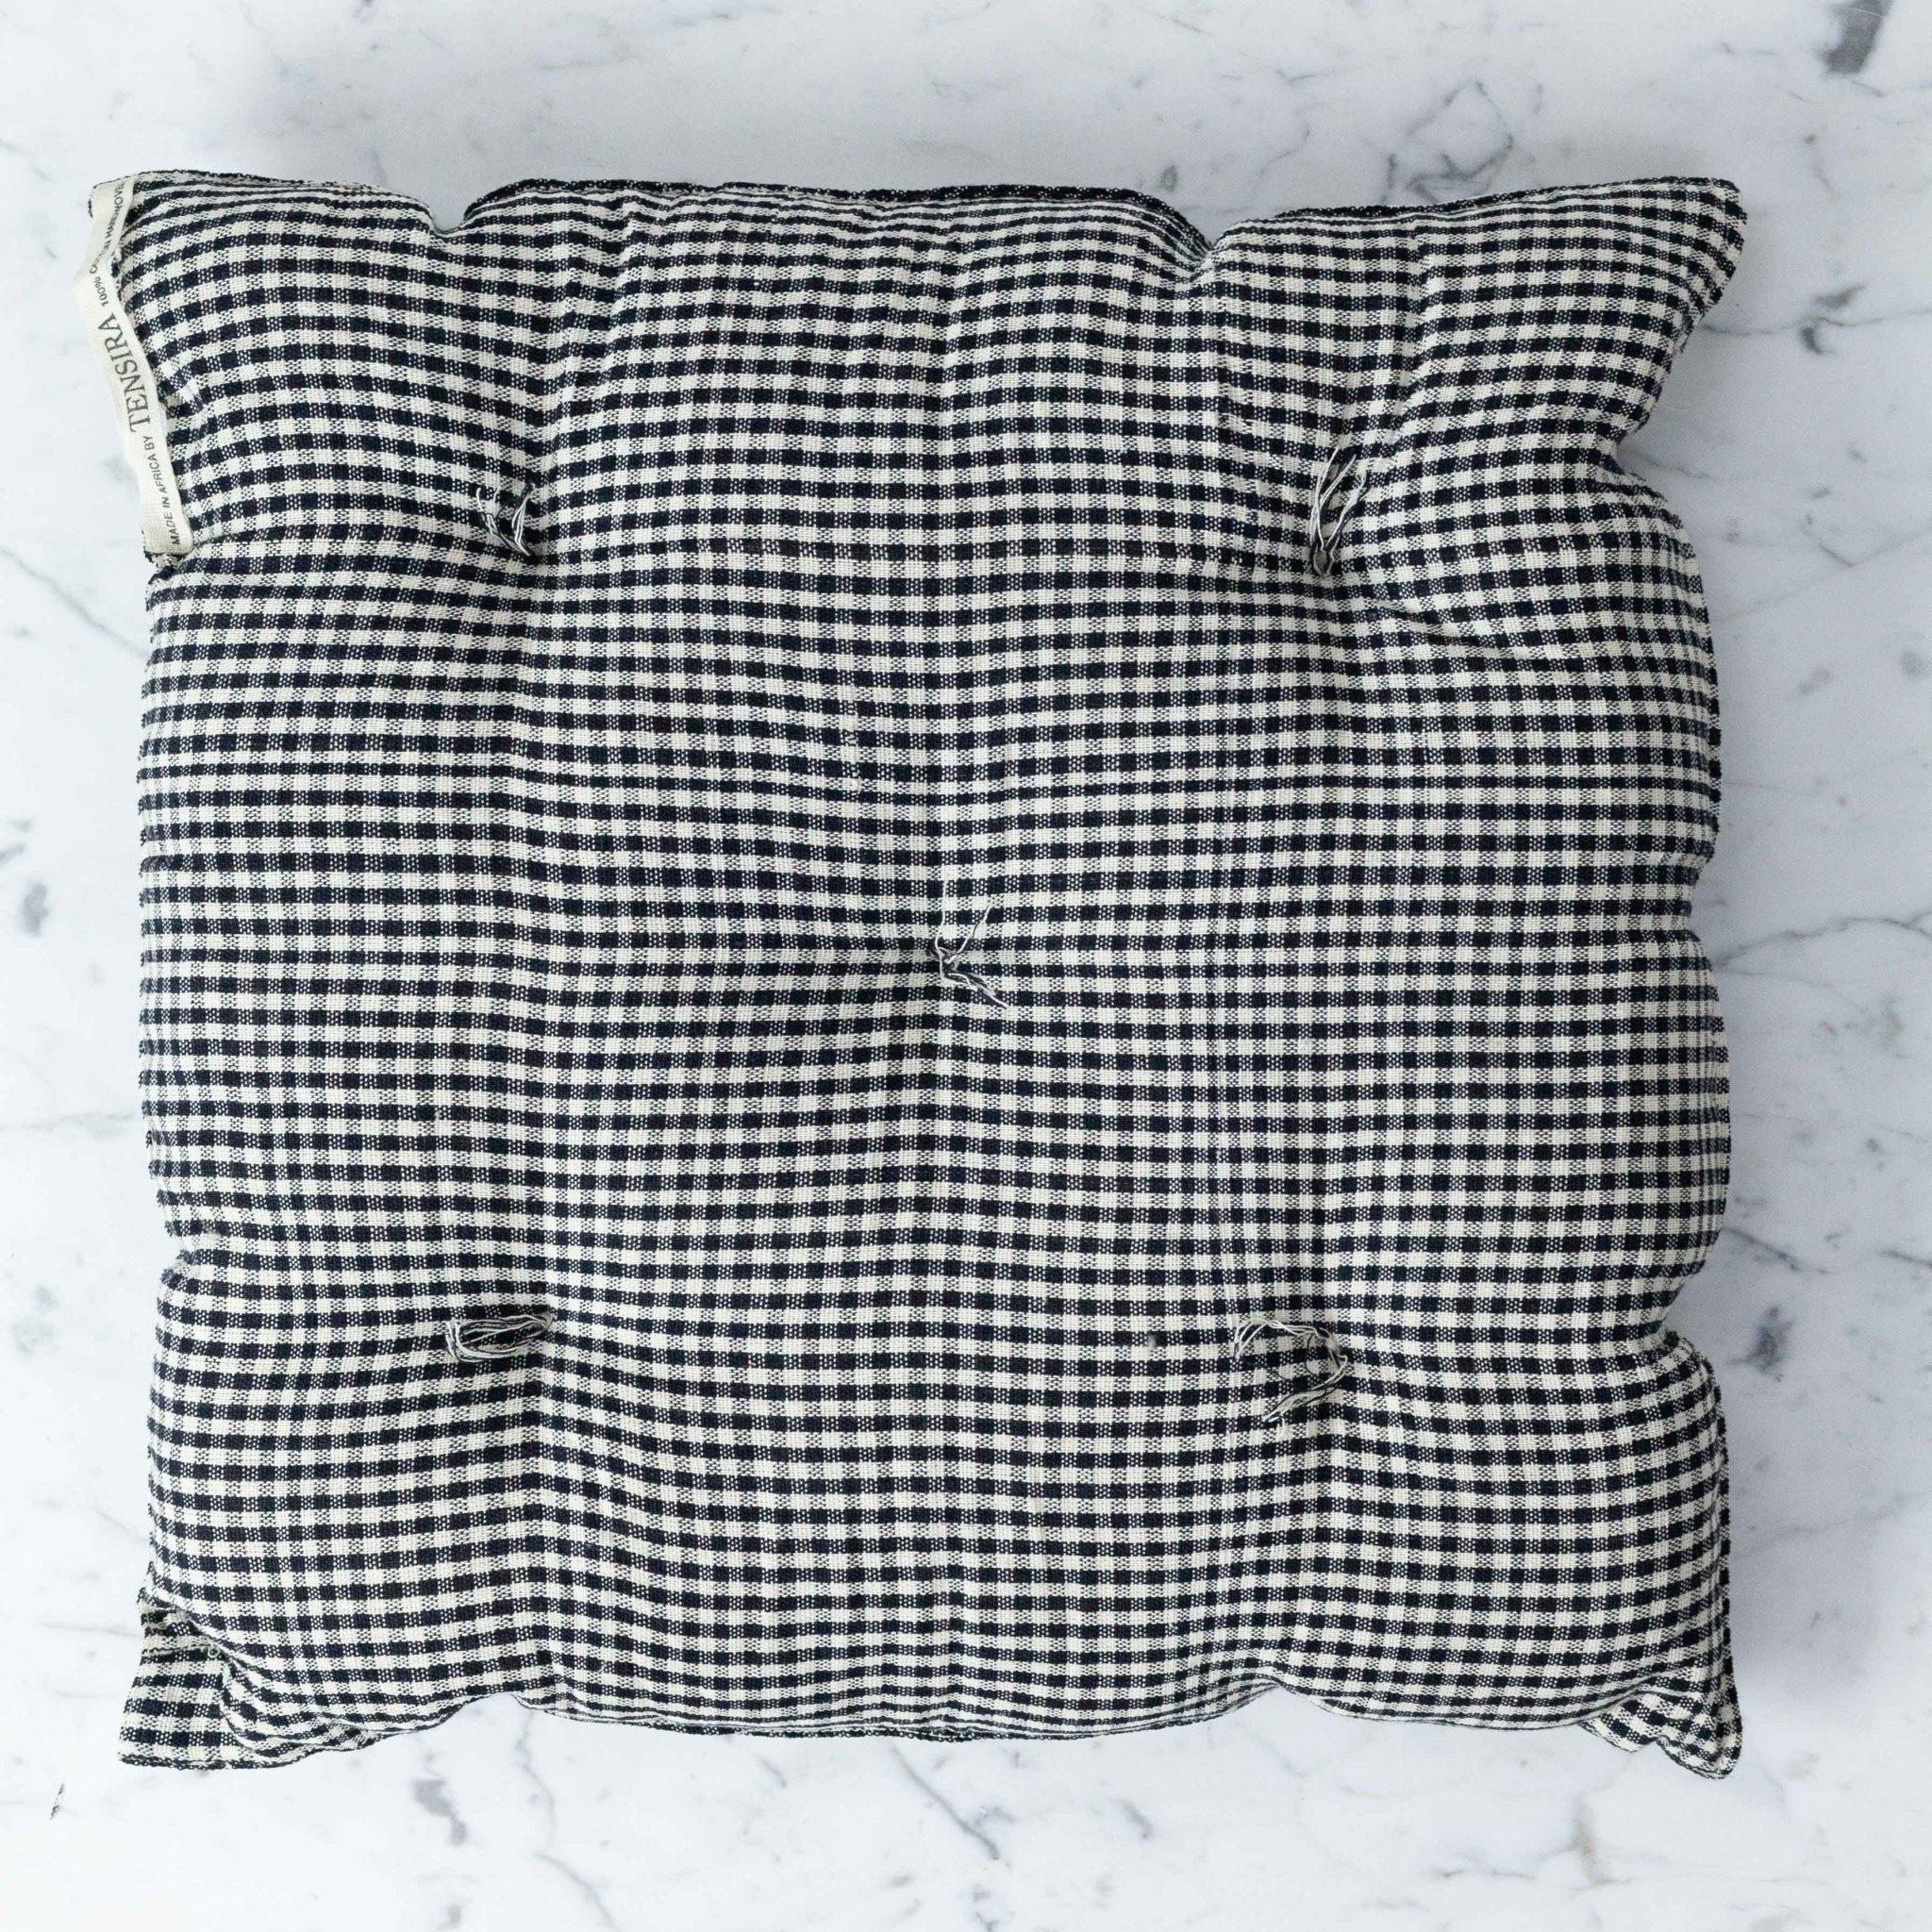 TENSIRA Handwoven Cotton Chair Cushion - Black + White Gingham - 16 x 16 inch